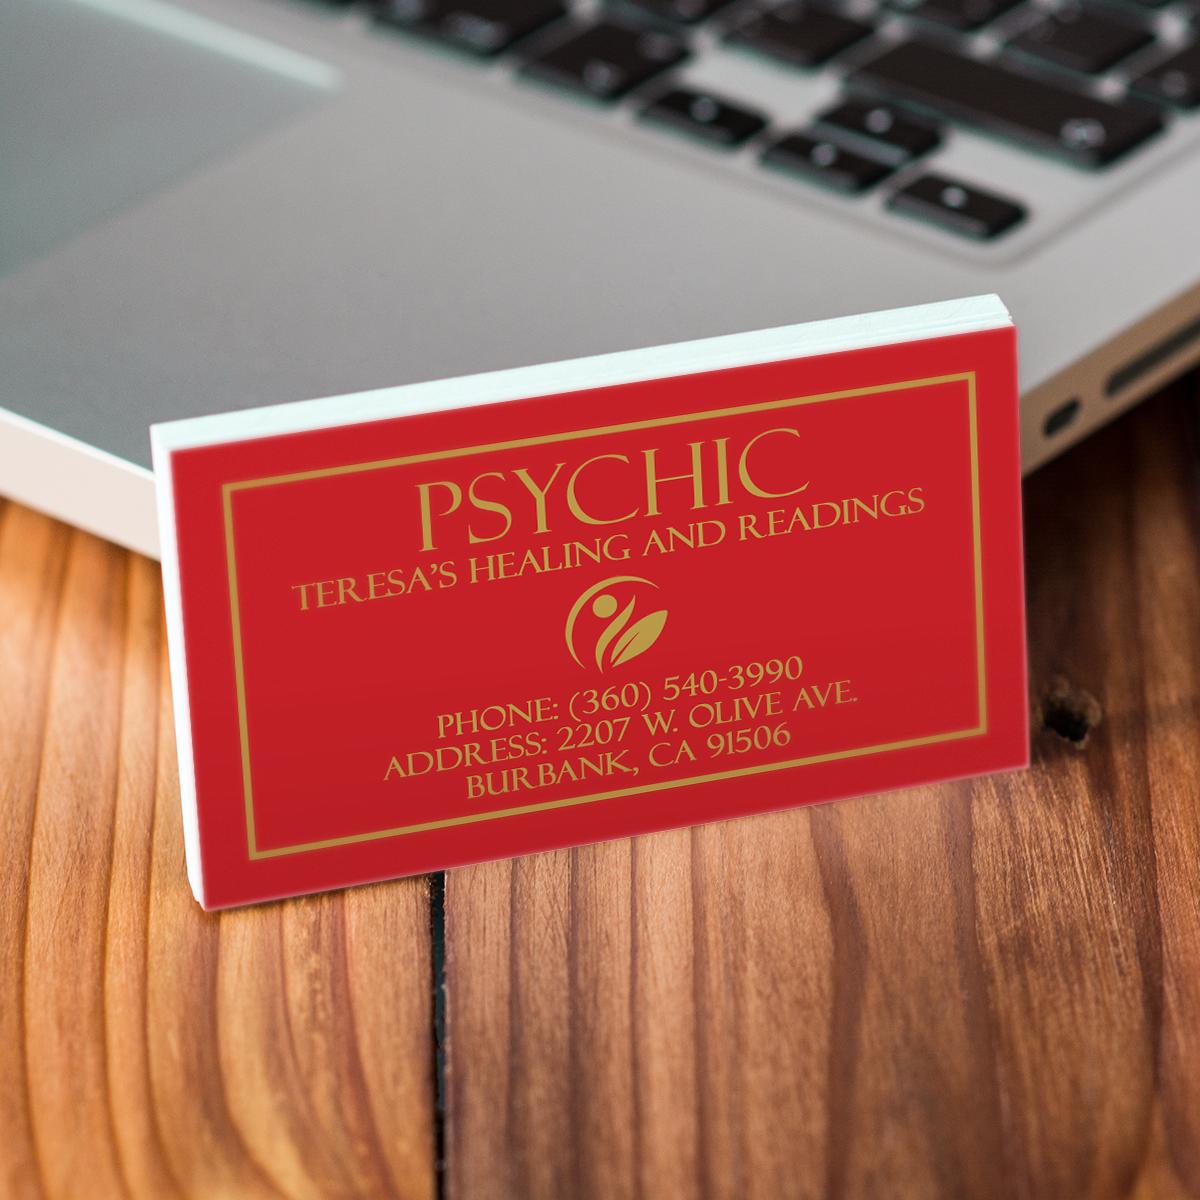 Psychic Teresa's Healing and Readings